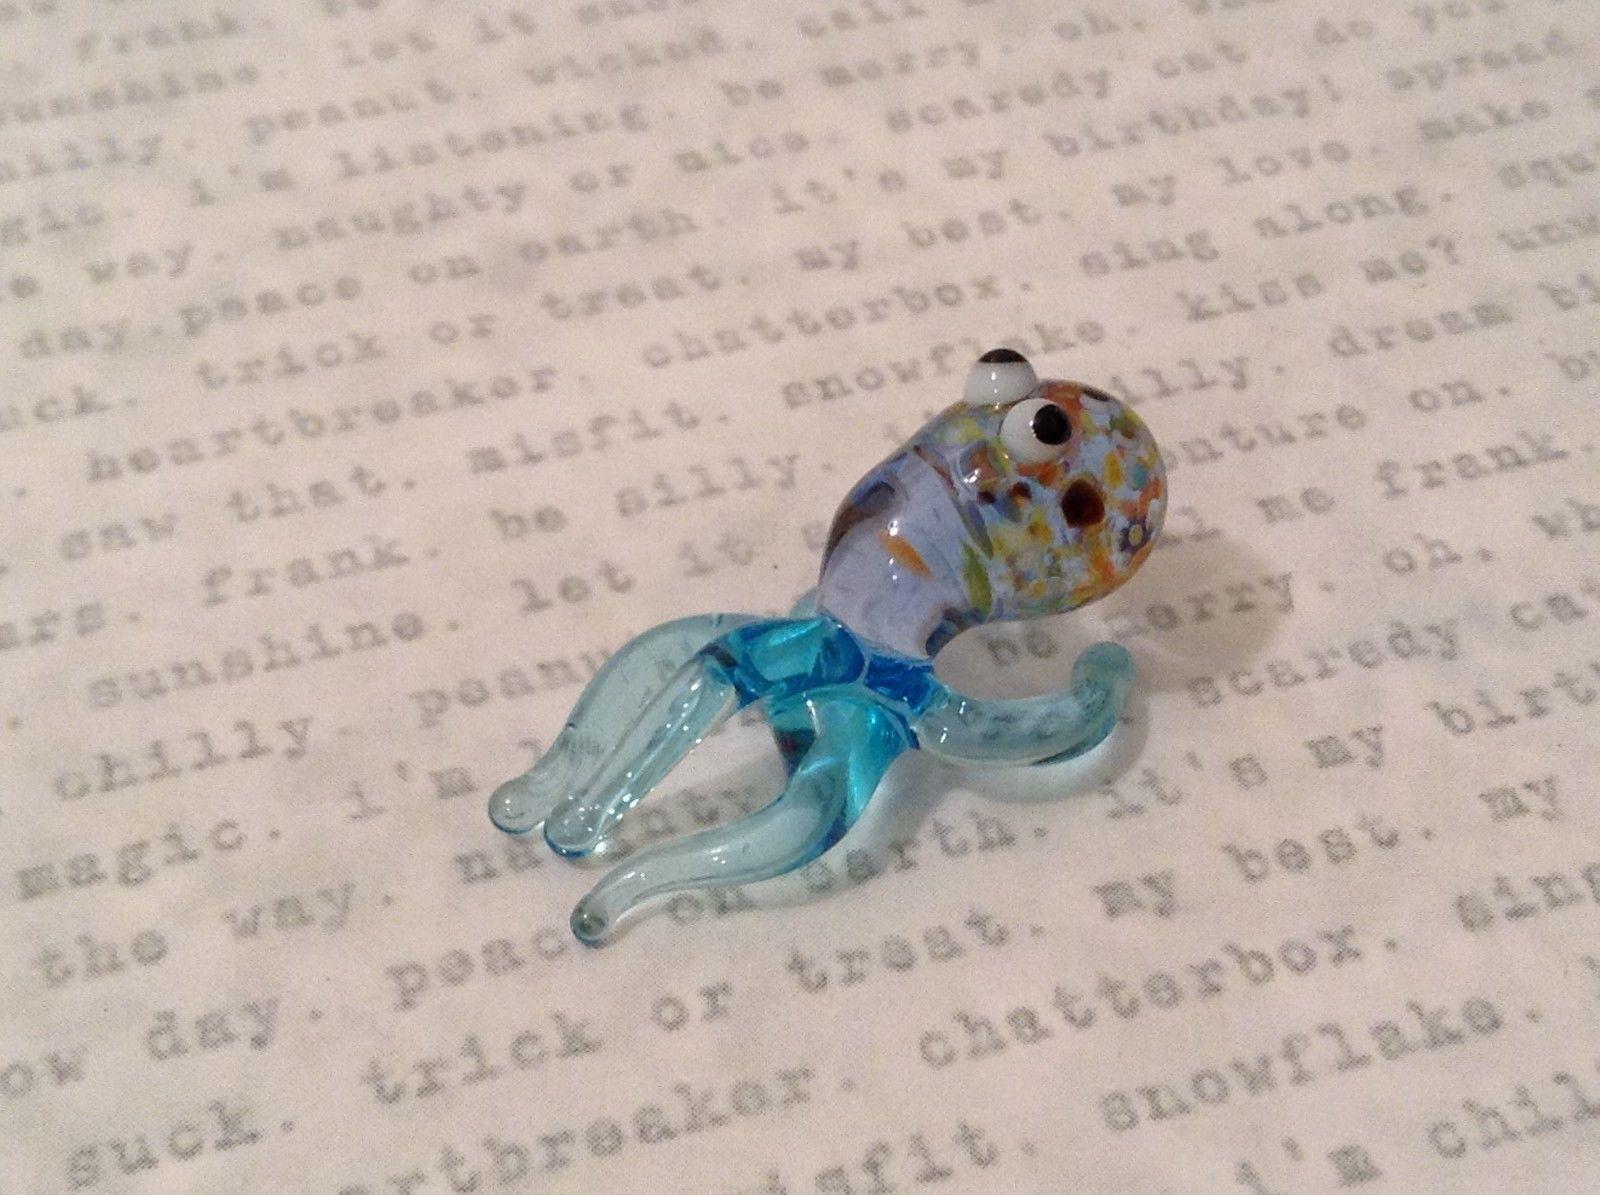 Micro miniature hand blown glass figurine USA blue speckled octopus NIB